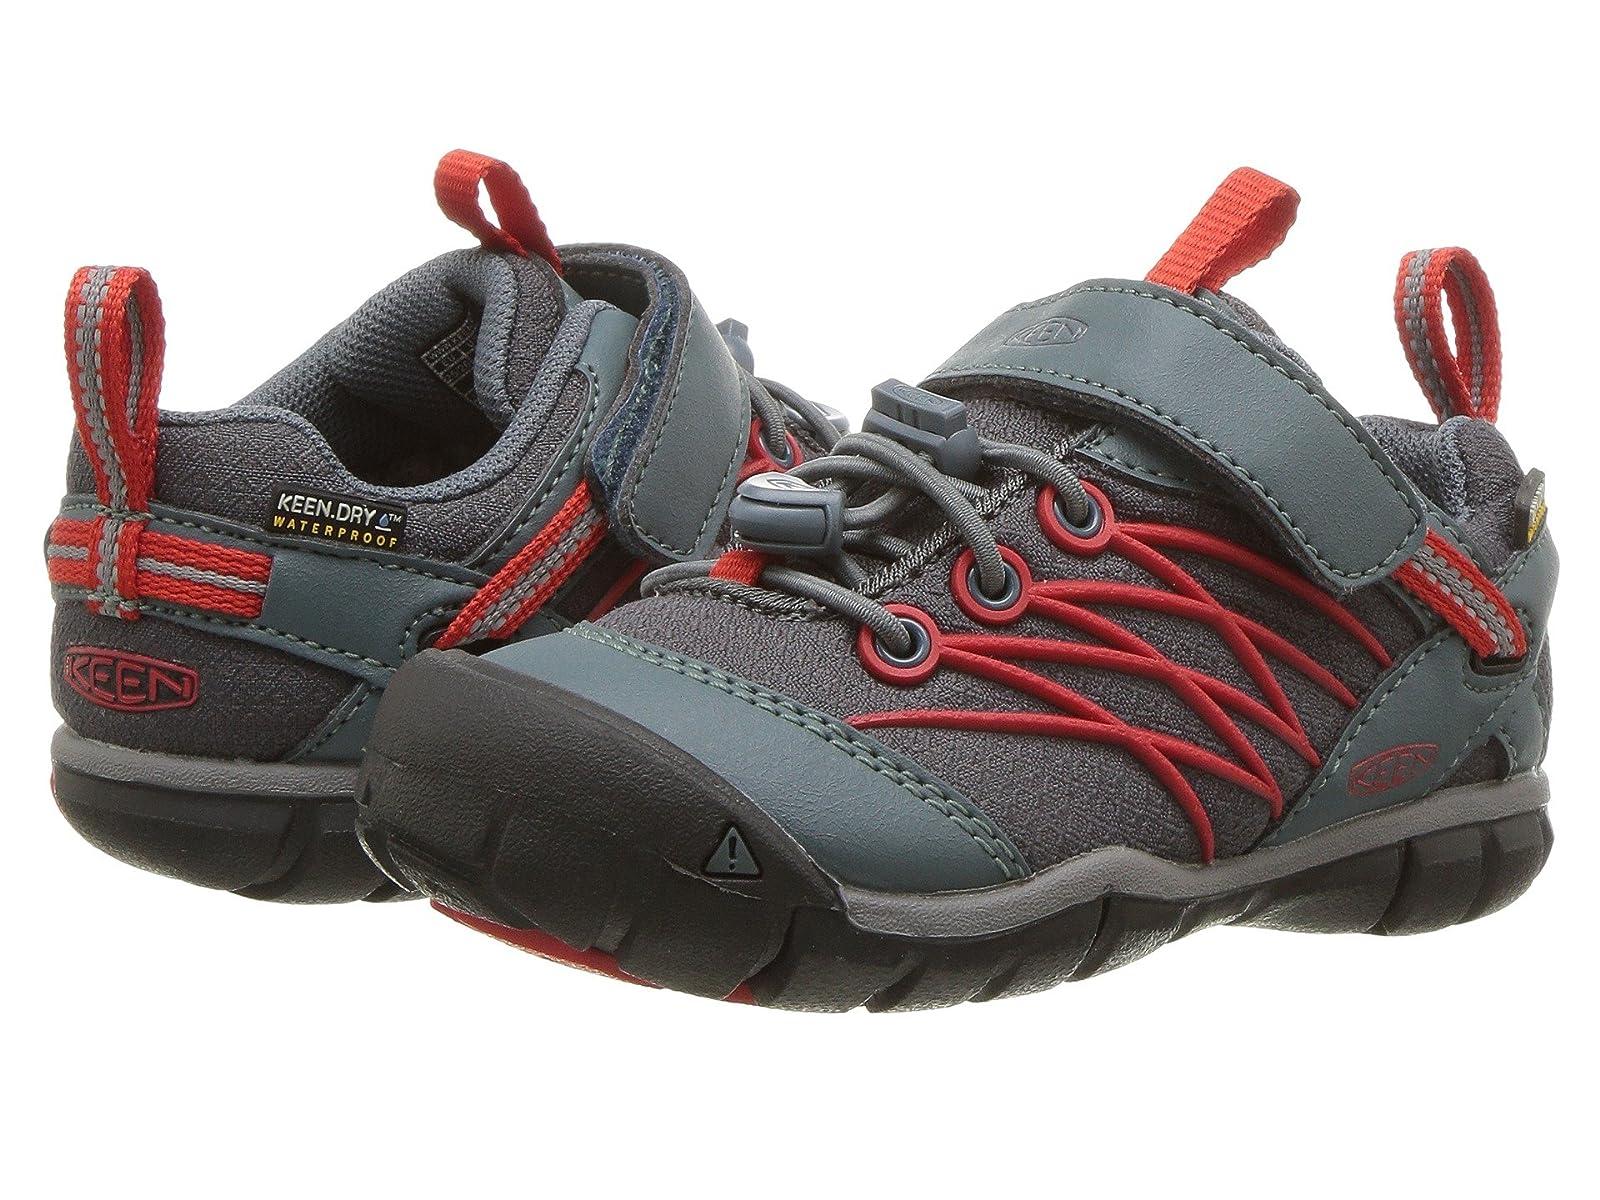 Keen Kids Chandler CNX WP (Toddler/Little Kid)Atmospheric grades have affordable shoes